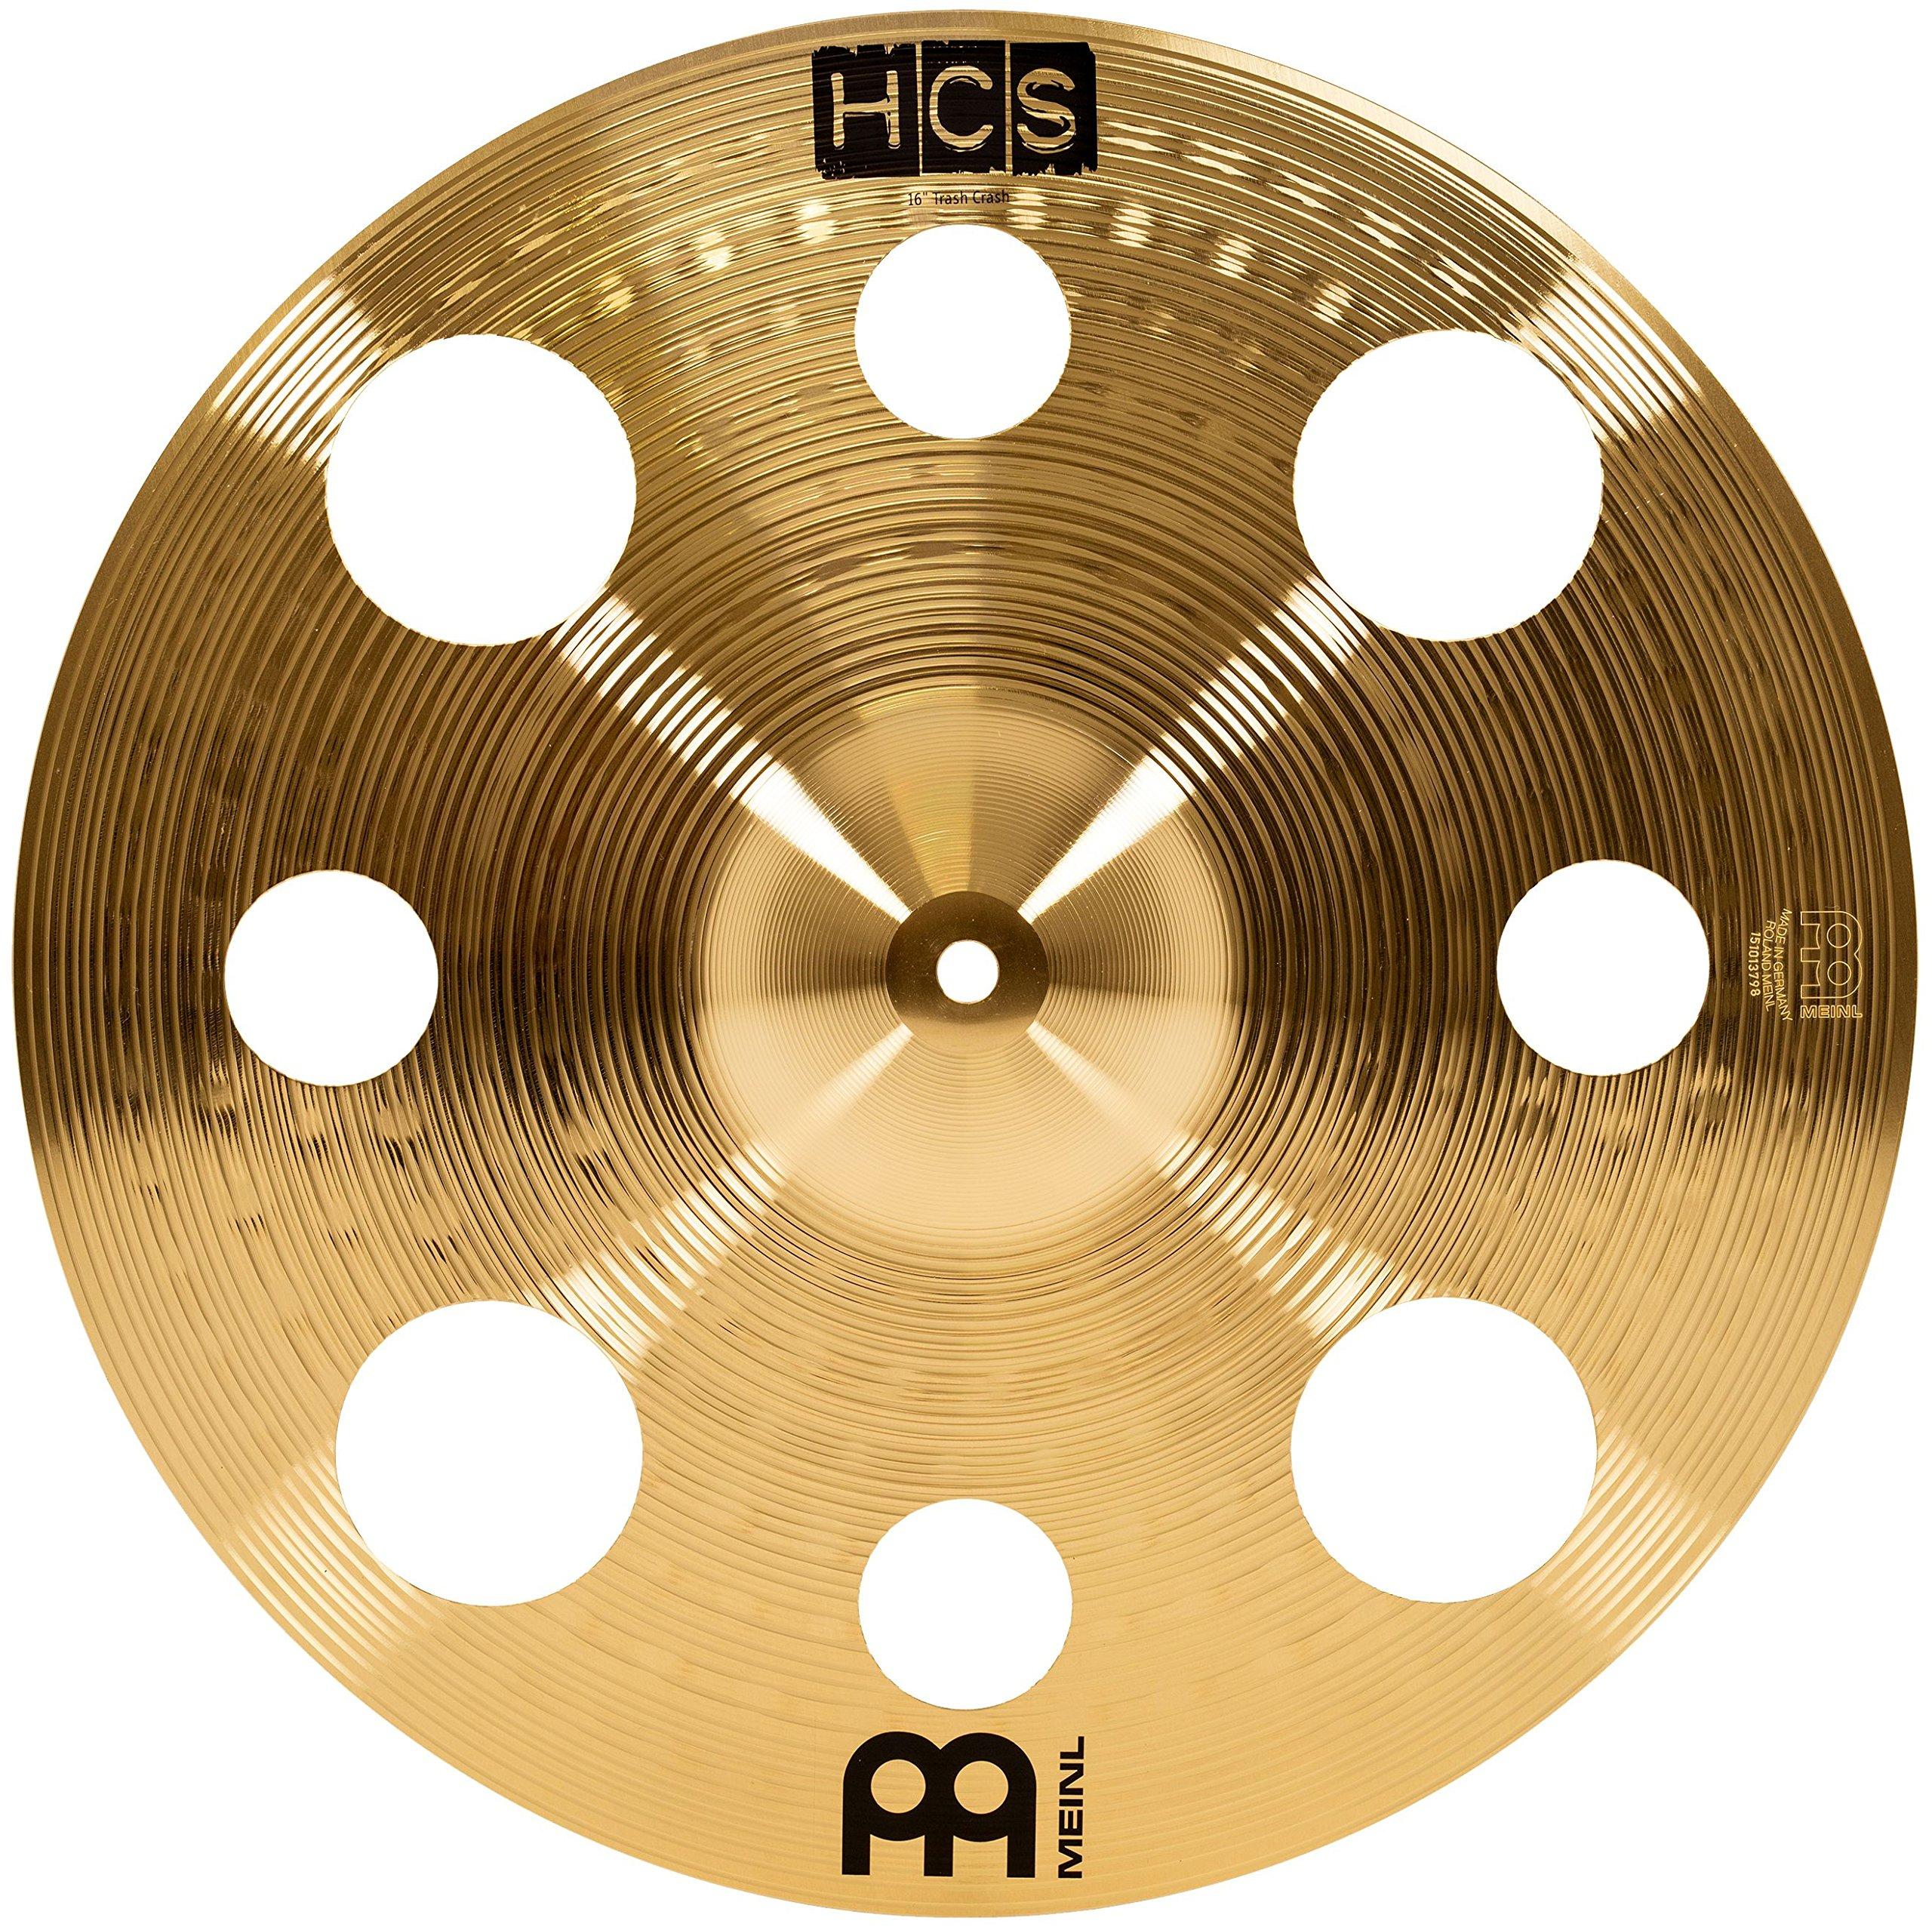 Meinl Cymbals HCS16TRC 16'' HCS Brass Trash Crash Cymbal for Drum Set (VIDEO)